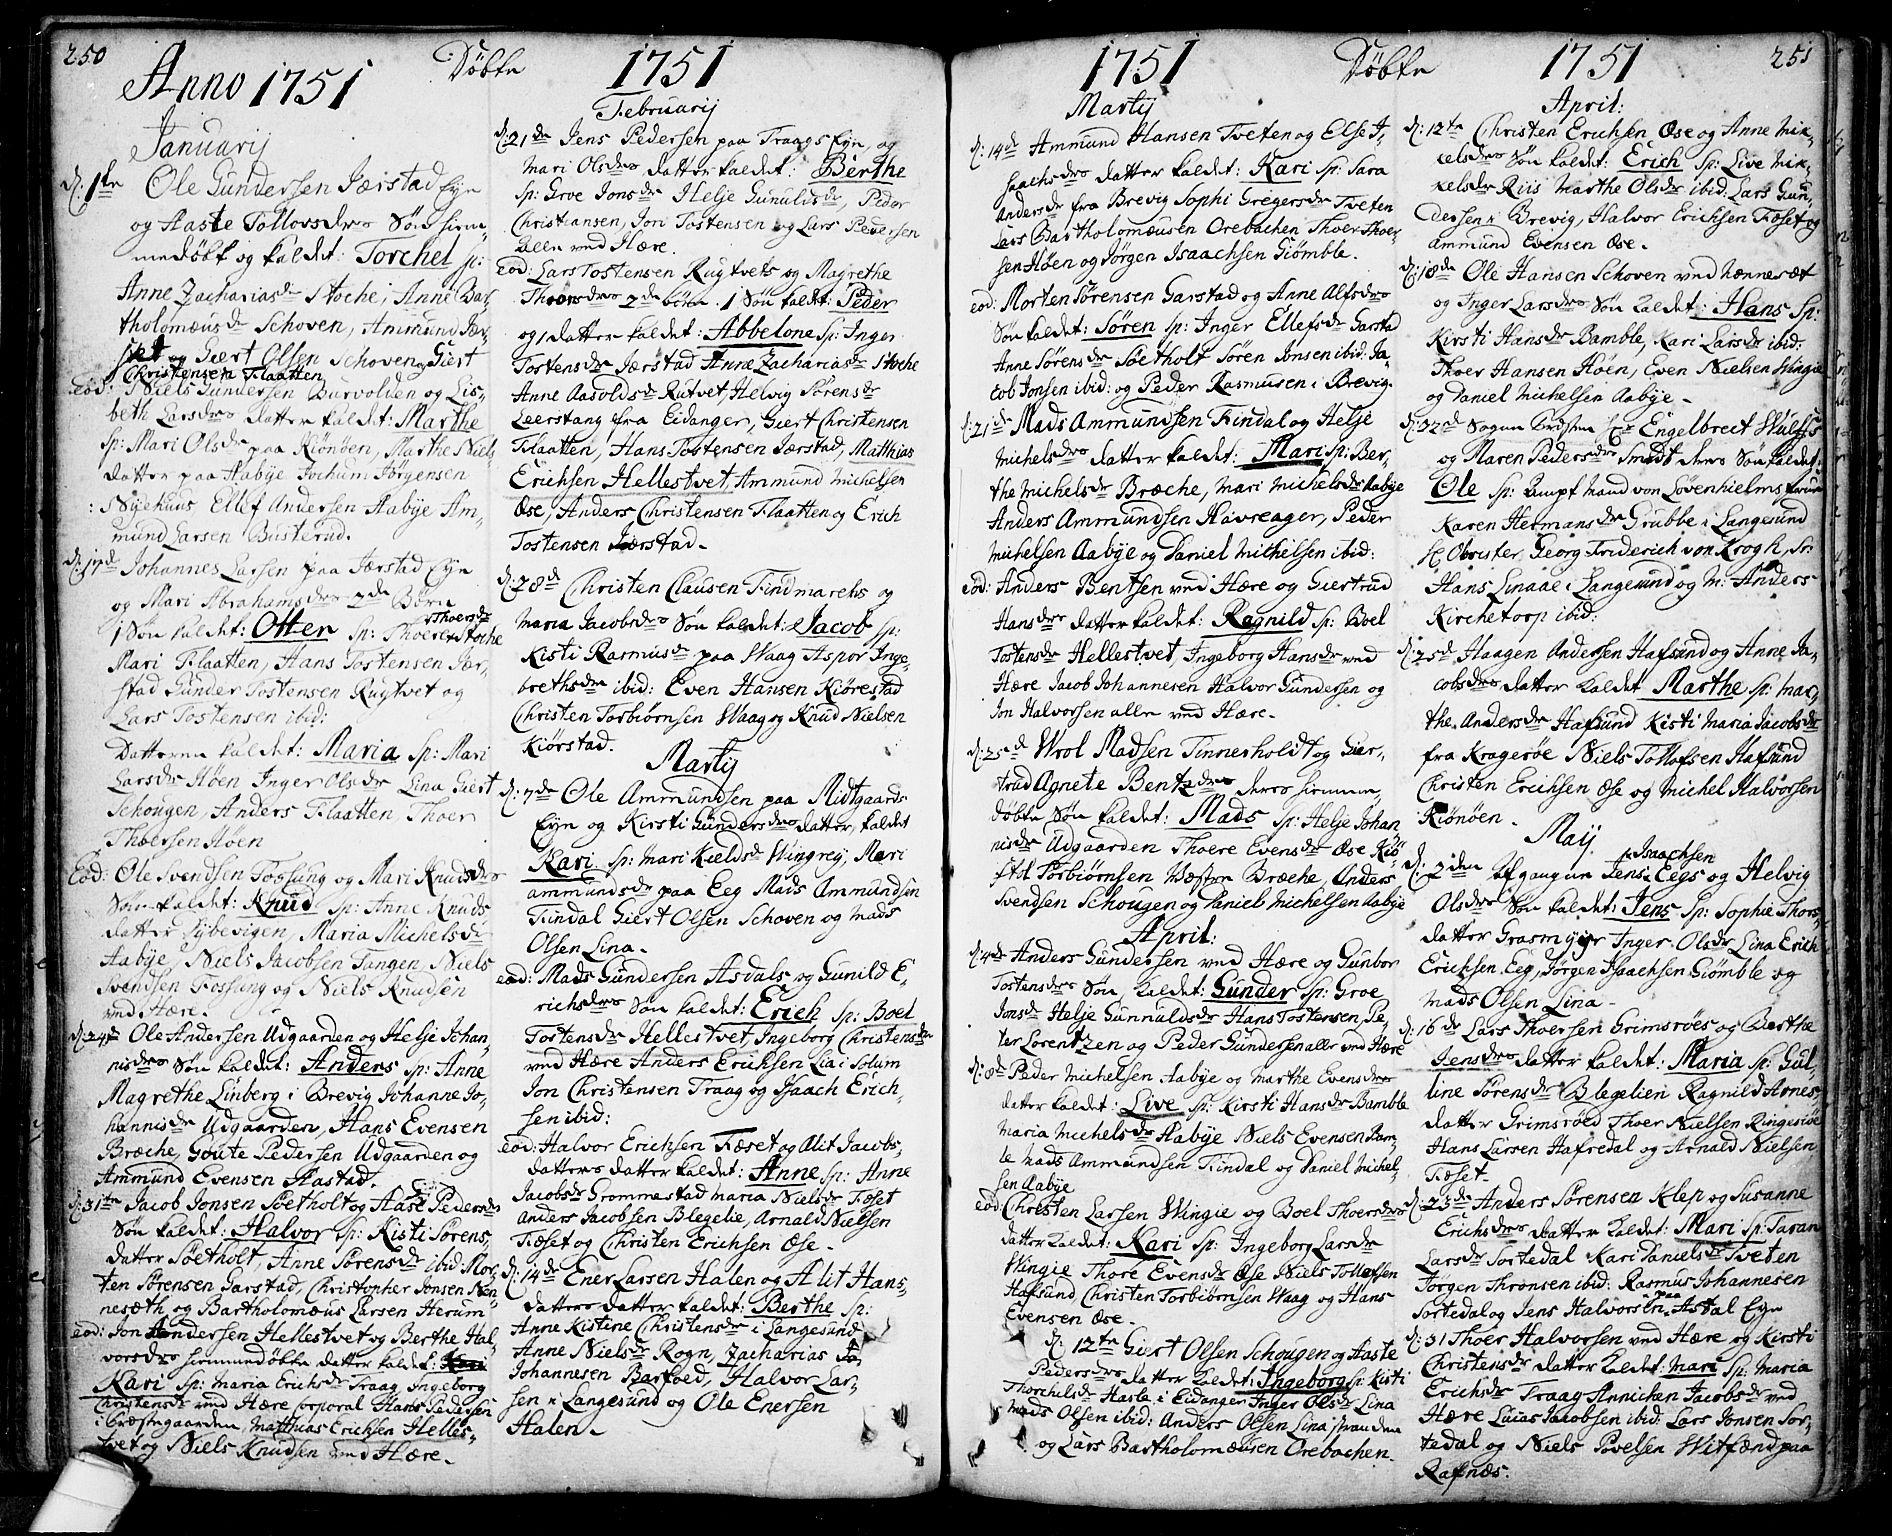 SAKO, Bamble kirkebøker, F/Fa/L0001: Ministerialbok nr. I 1, 1702-1774, s. 250-251